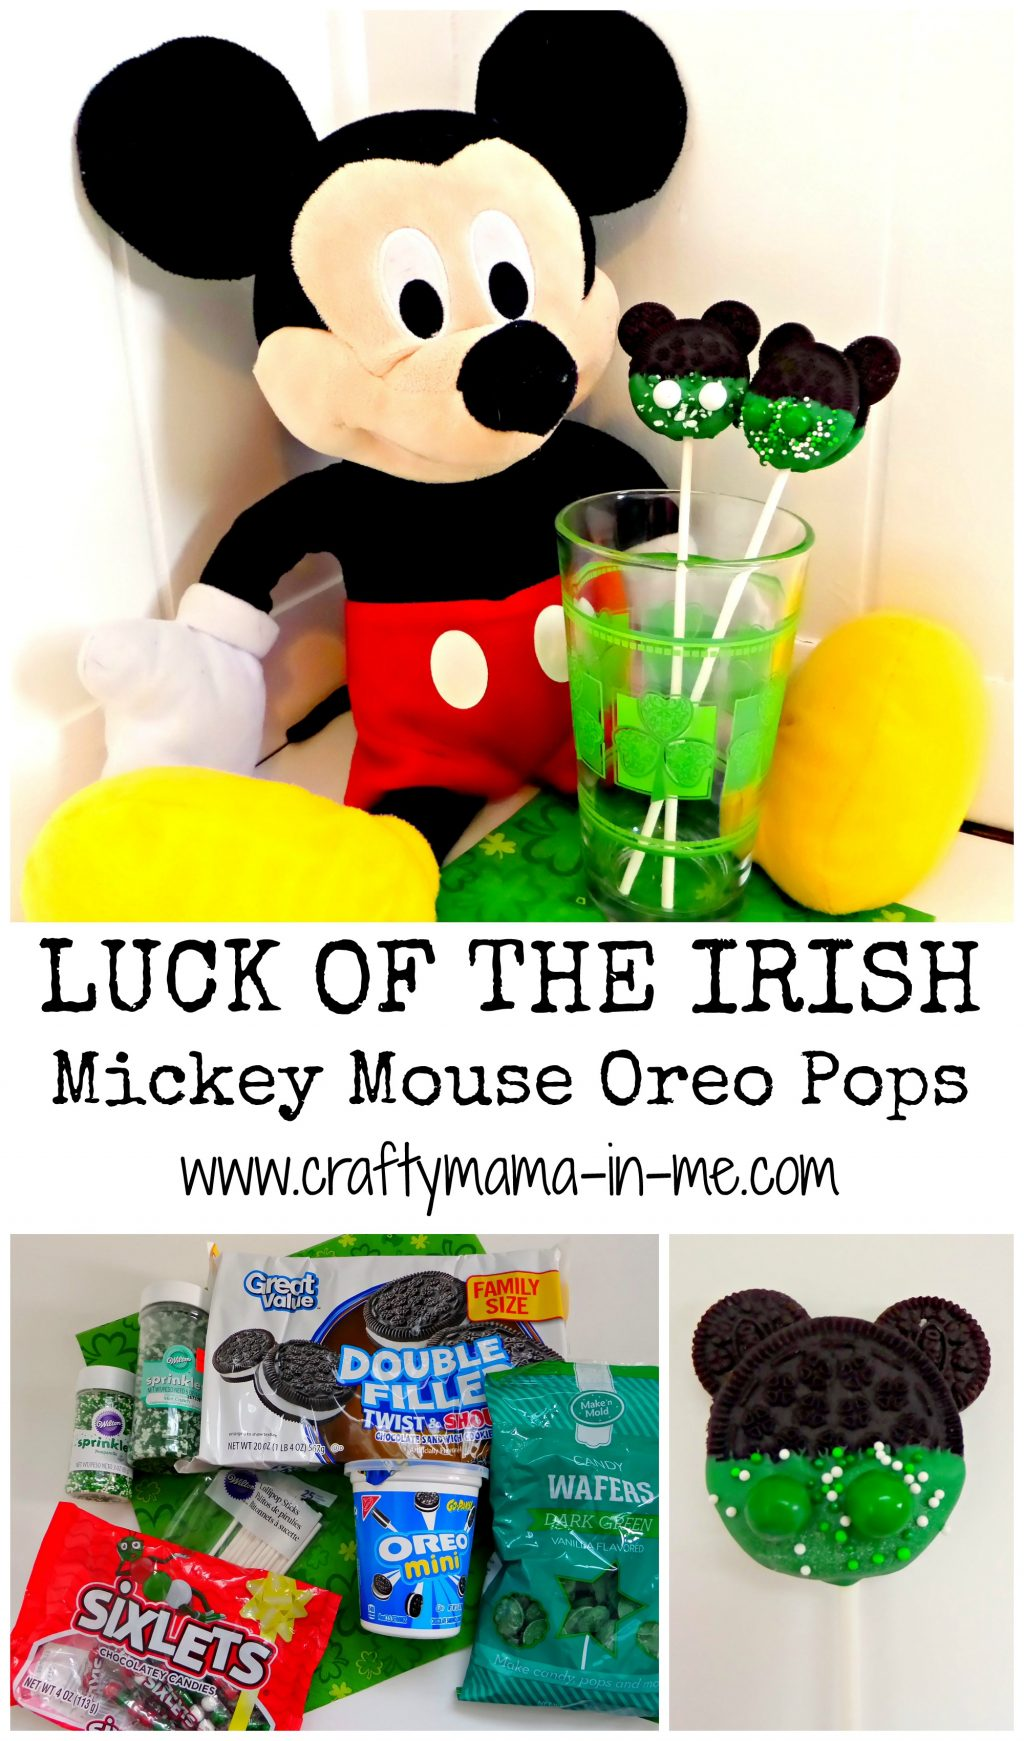 Luck of the Irish Mickey Mouse Oreo Pops